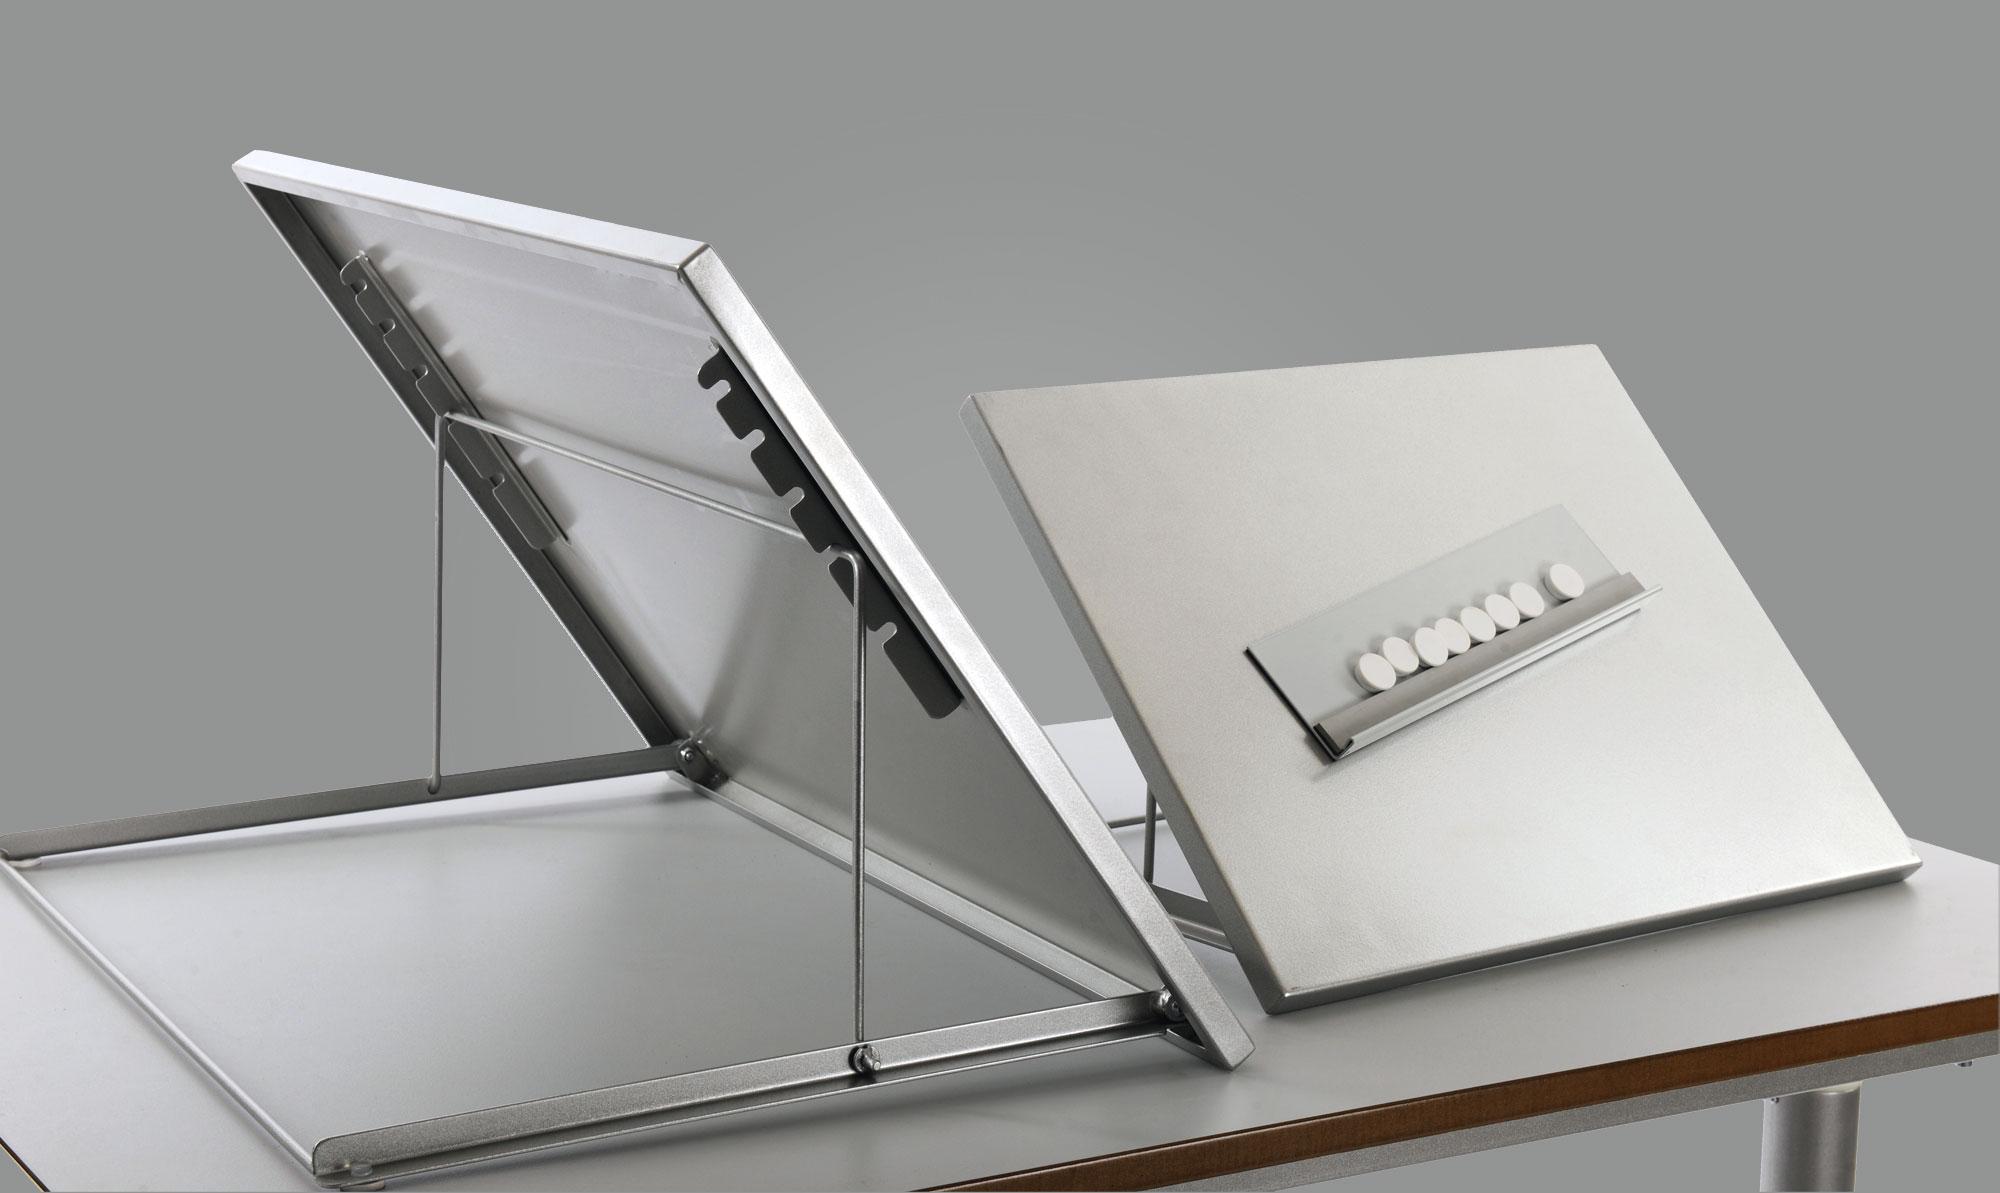 Hephaïstos mobilier ergonomique Sati bureau PMR